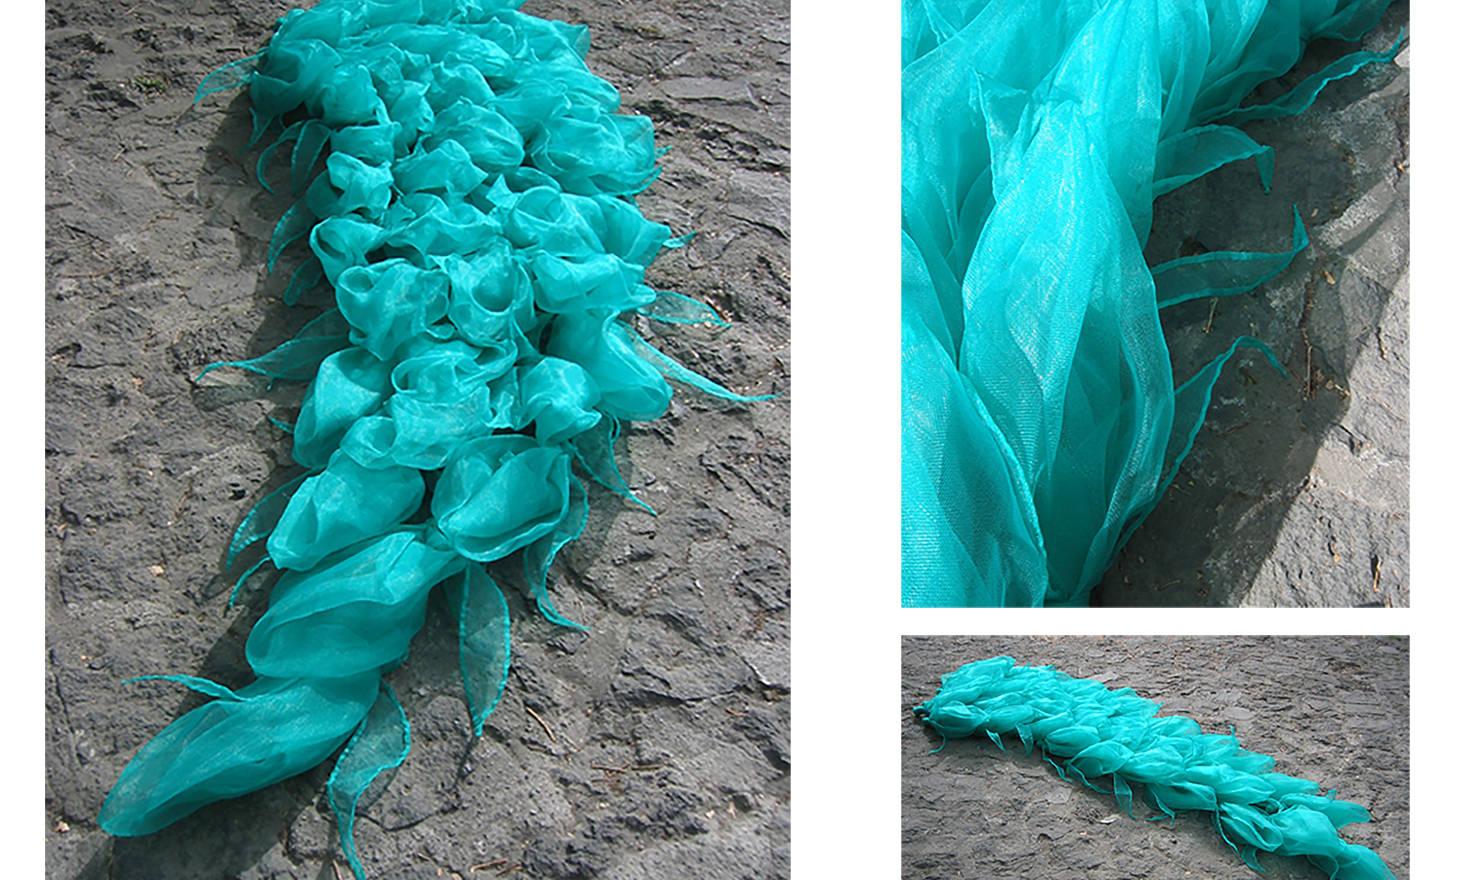 Hypertropic, 2007 Plastic mesh and fishing thread. 23.62 x 11.81 x 120.07 inches. 60 x 30 x 305 cm.